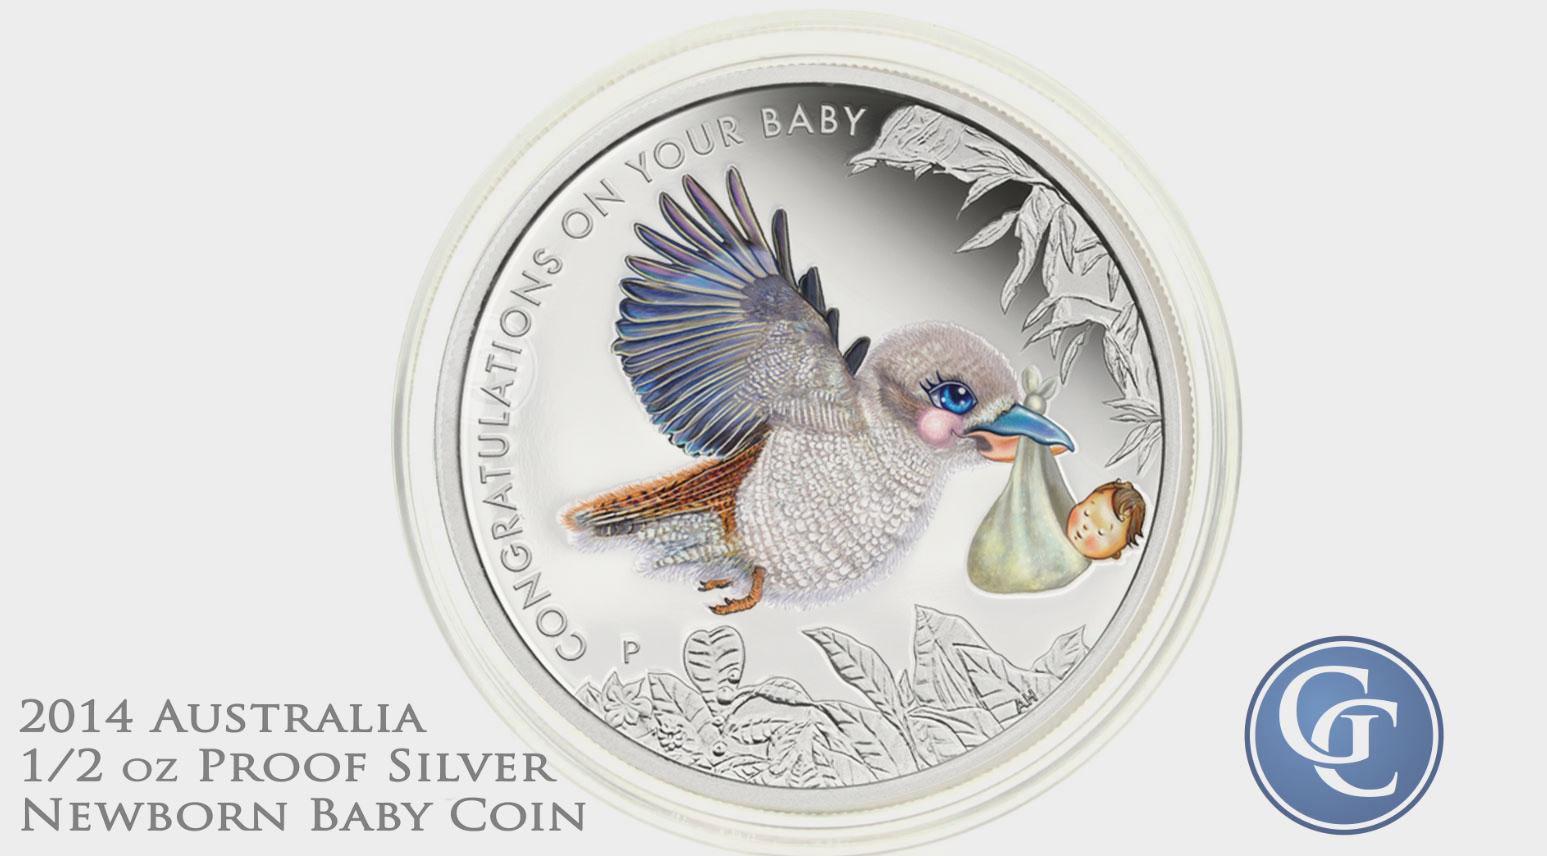 2014 Australian 1/2oz Proof Silver Newborn Baby